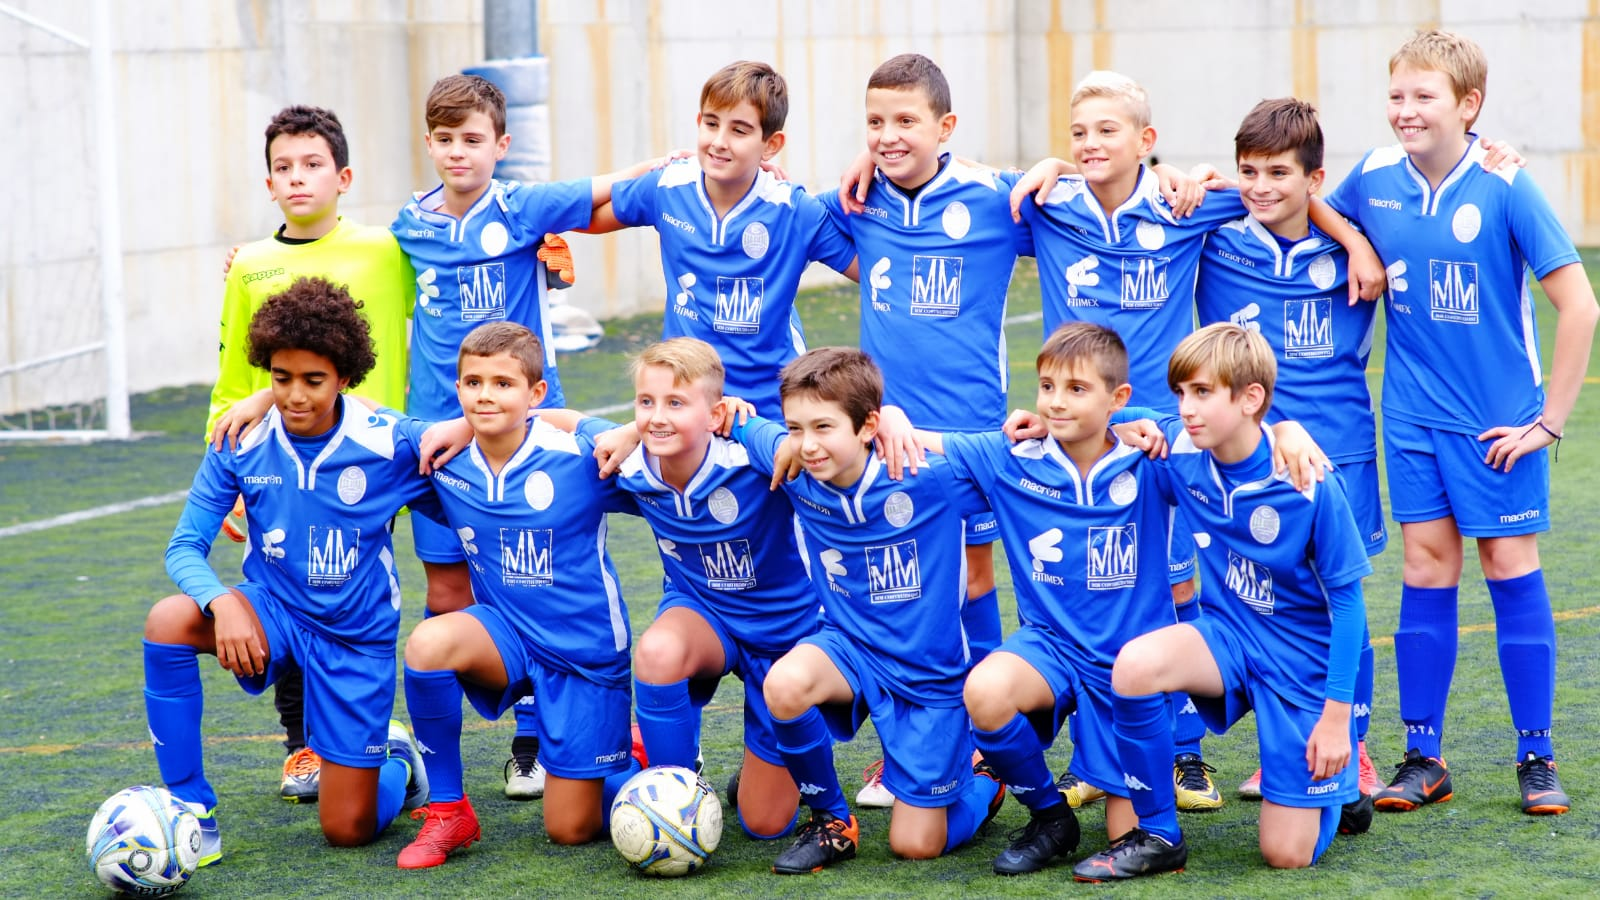 esordienti 2008 gruppo ceriale calcio